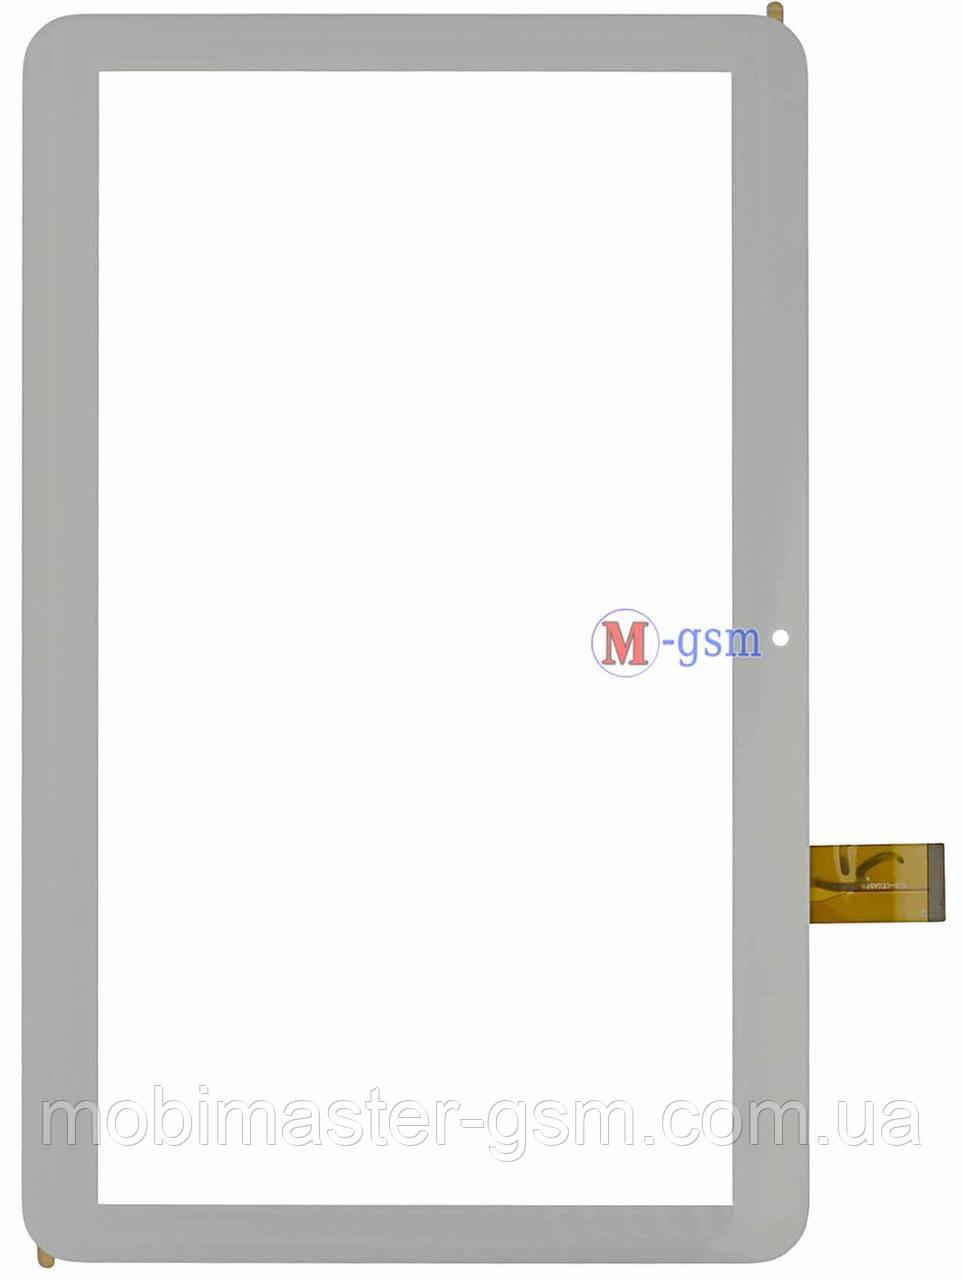 "Тачскрин (сенсорный экран) 10.1"" 51 pin Tesla Magnet 3G (p/n: YLD-CEGA566-FPC-A0, Yld-cega617-fpc-a0 ) белый"